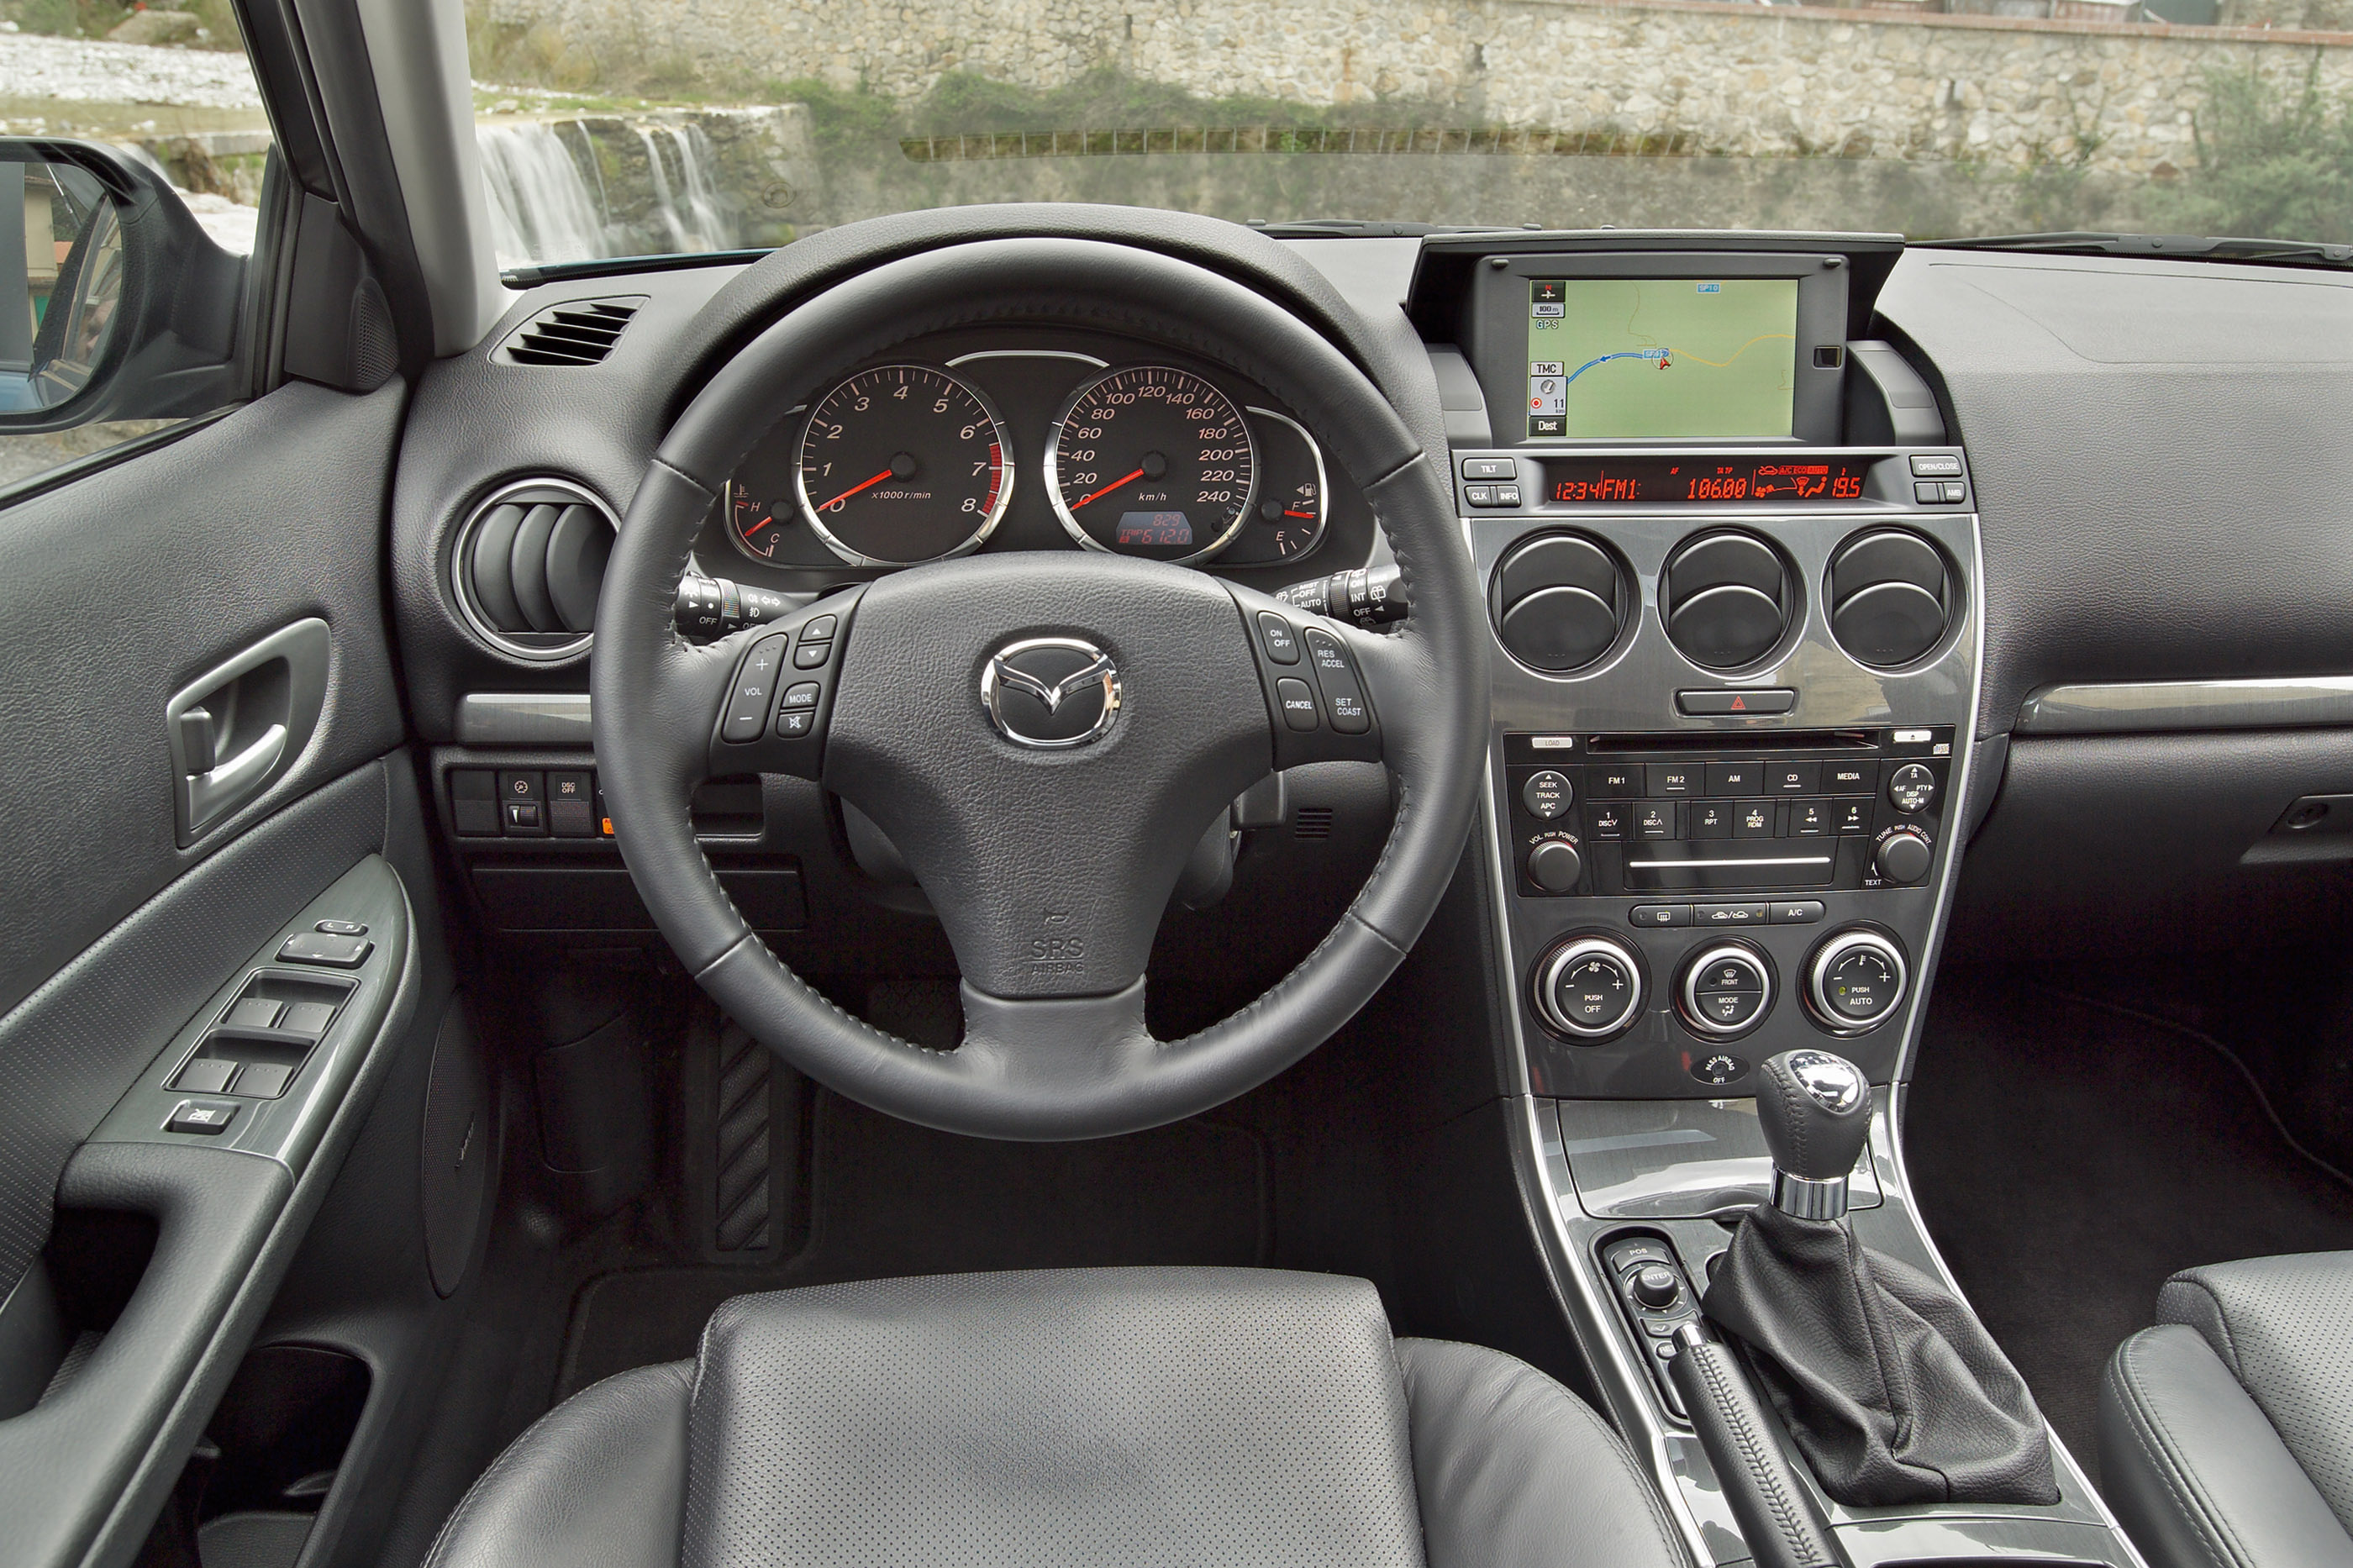 2005 Mazda 6 Wagon Facelift - HD Pictures @ carsinvasion.com